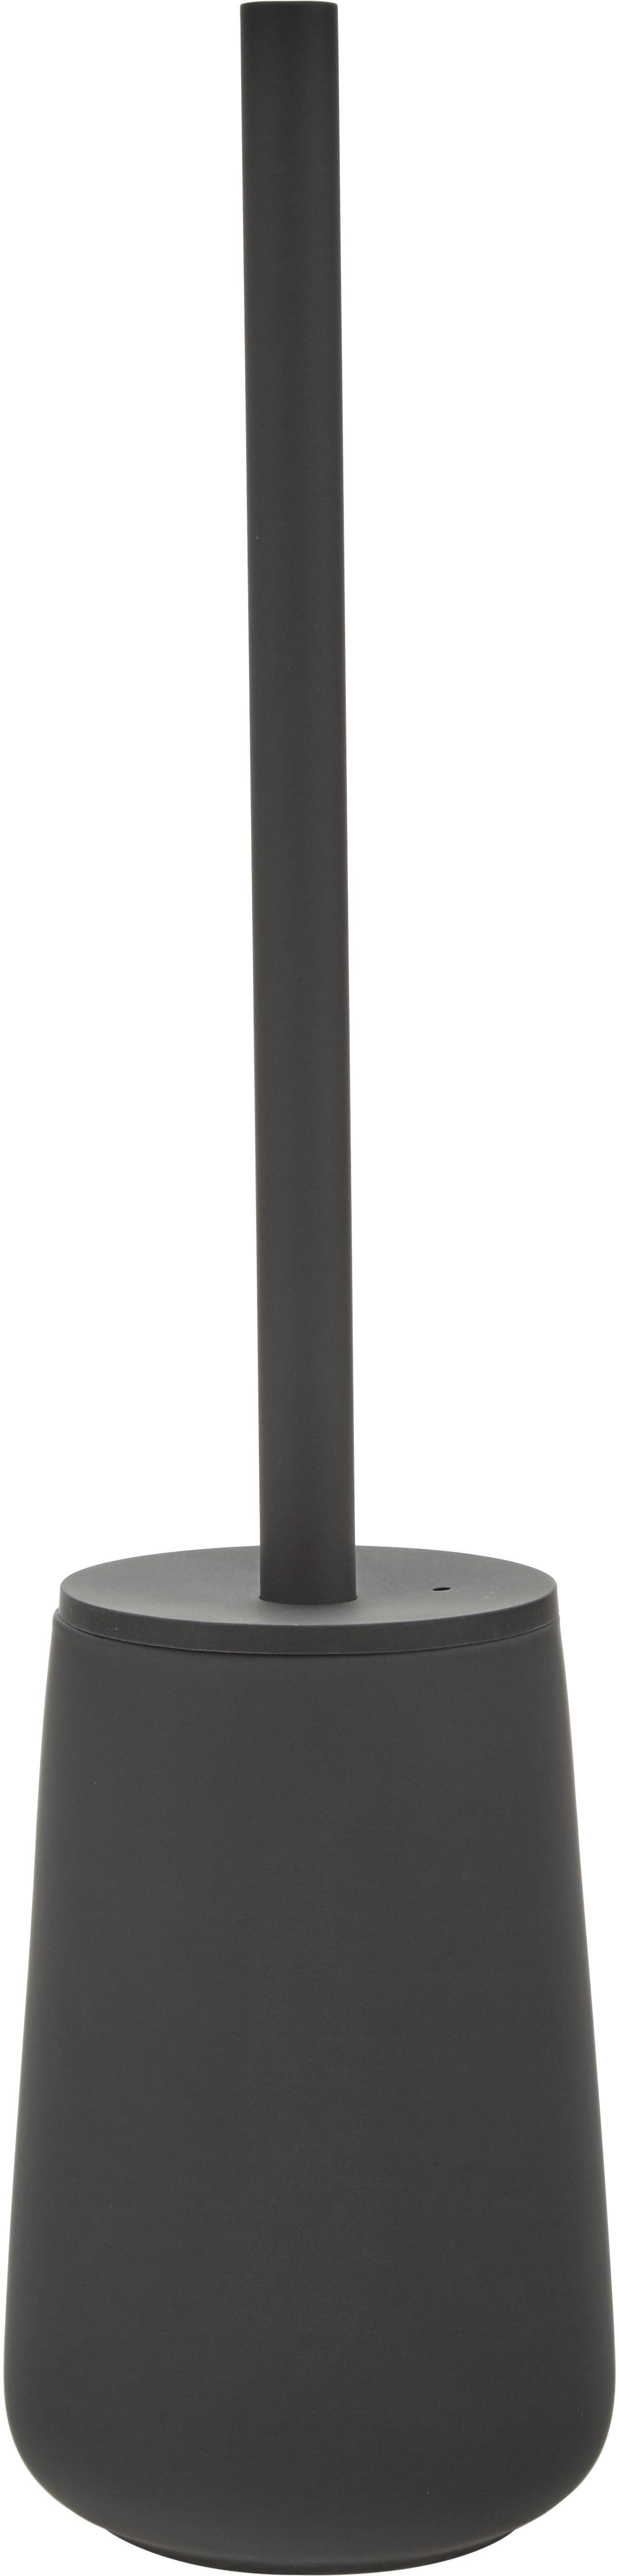 Escobilla de baño Nova One, Recipiente: porcelana, Negro, Ø 10 x Al 43 cm